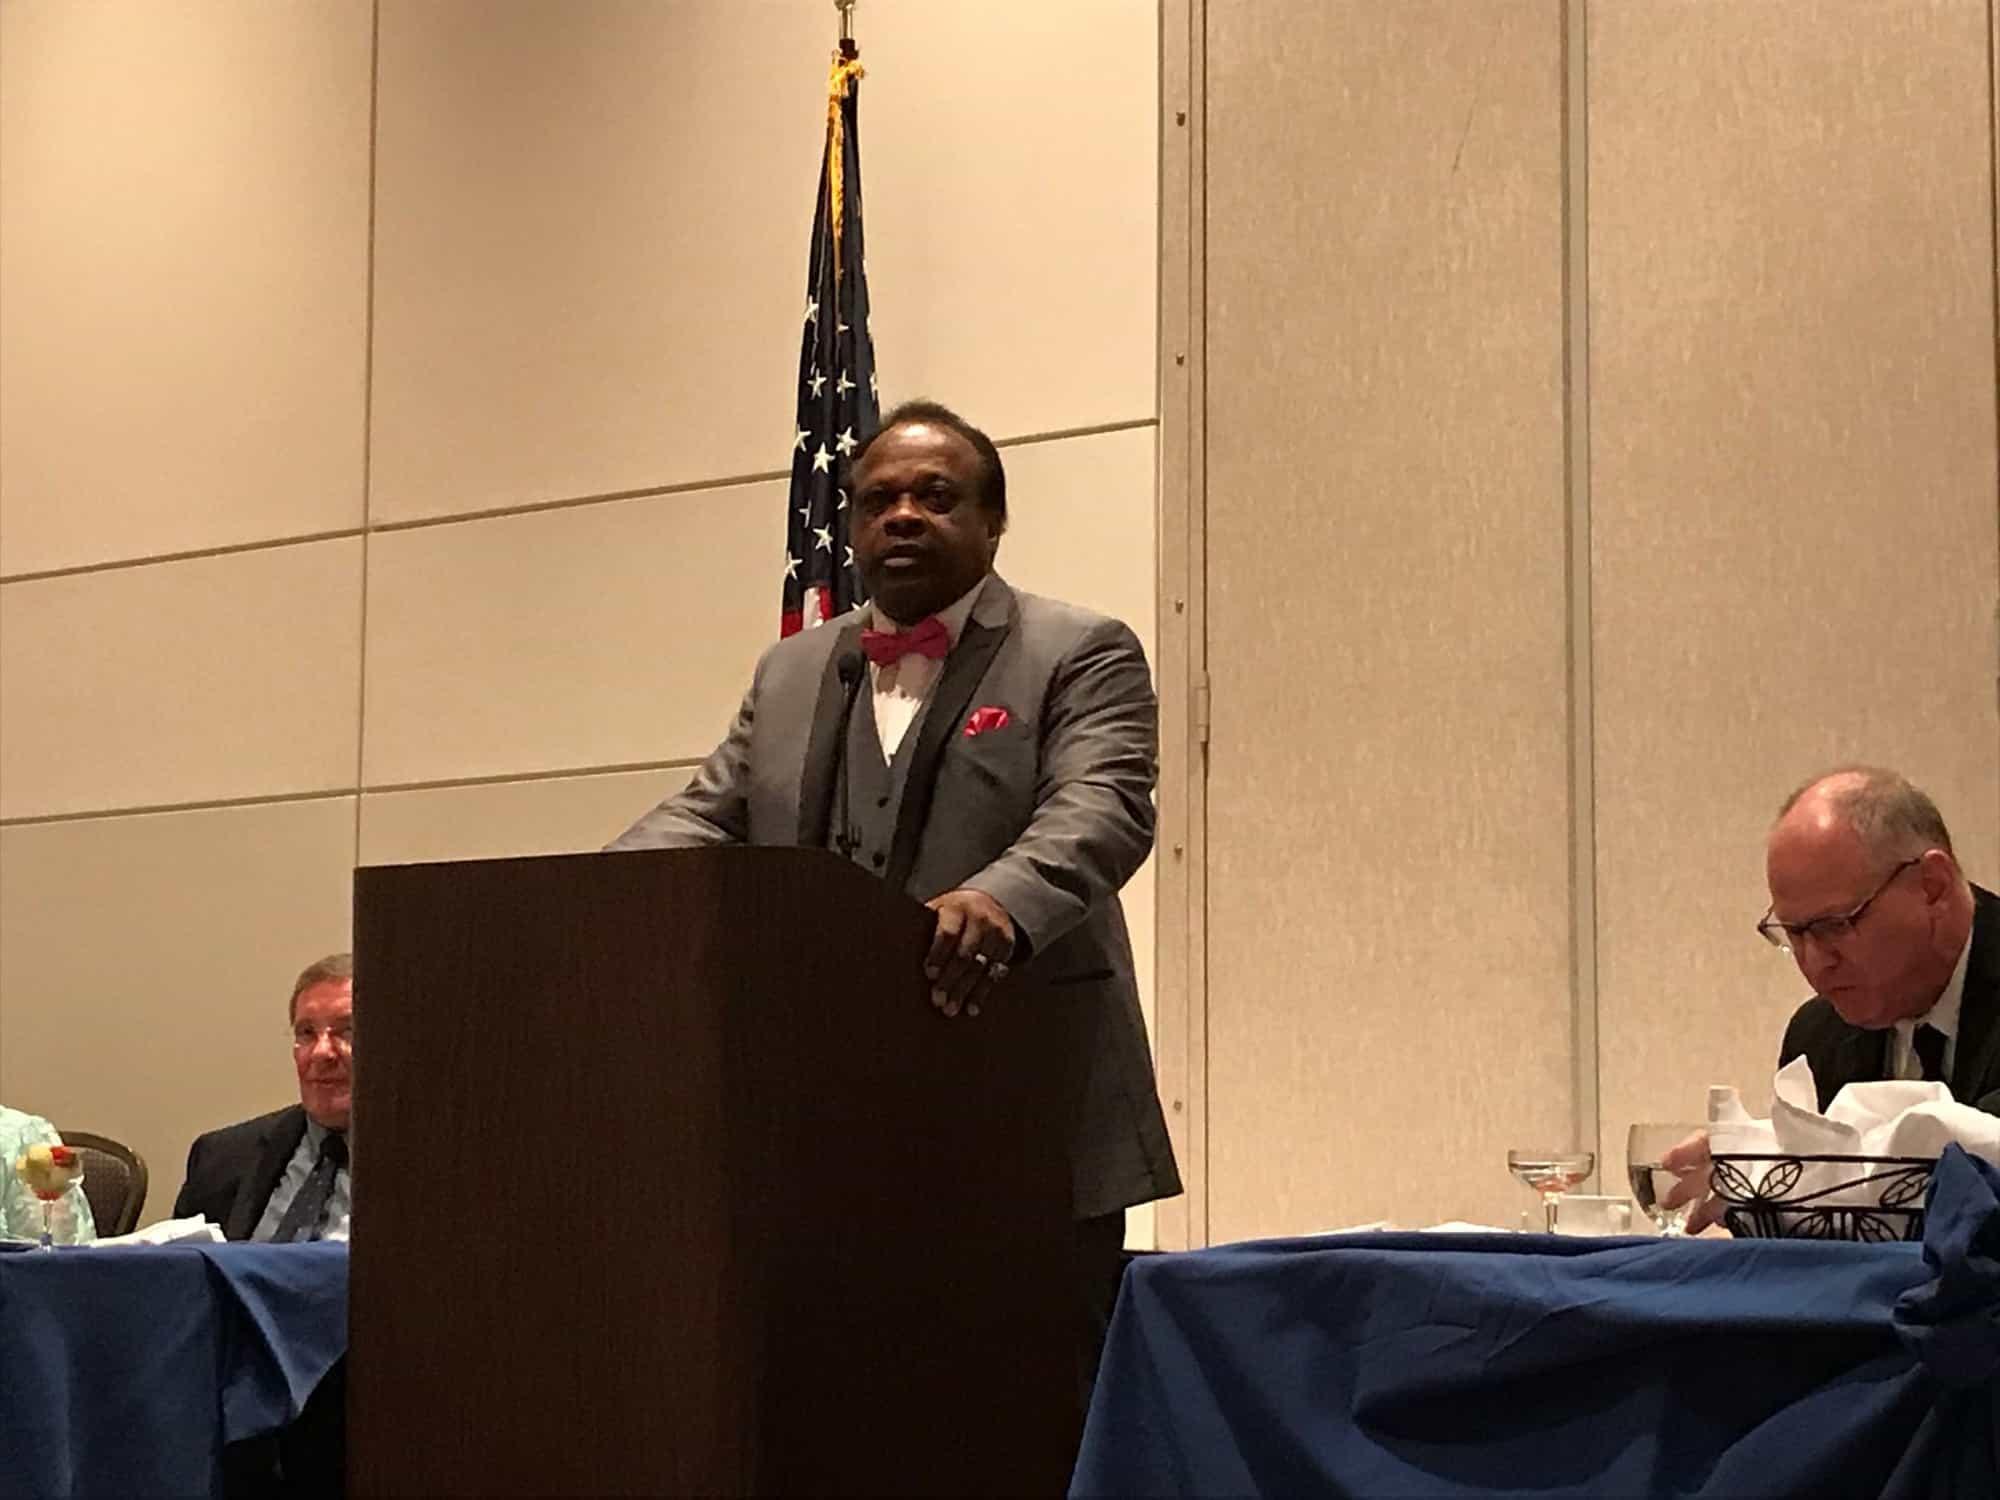 Al Oliver at podium